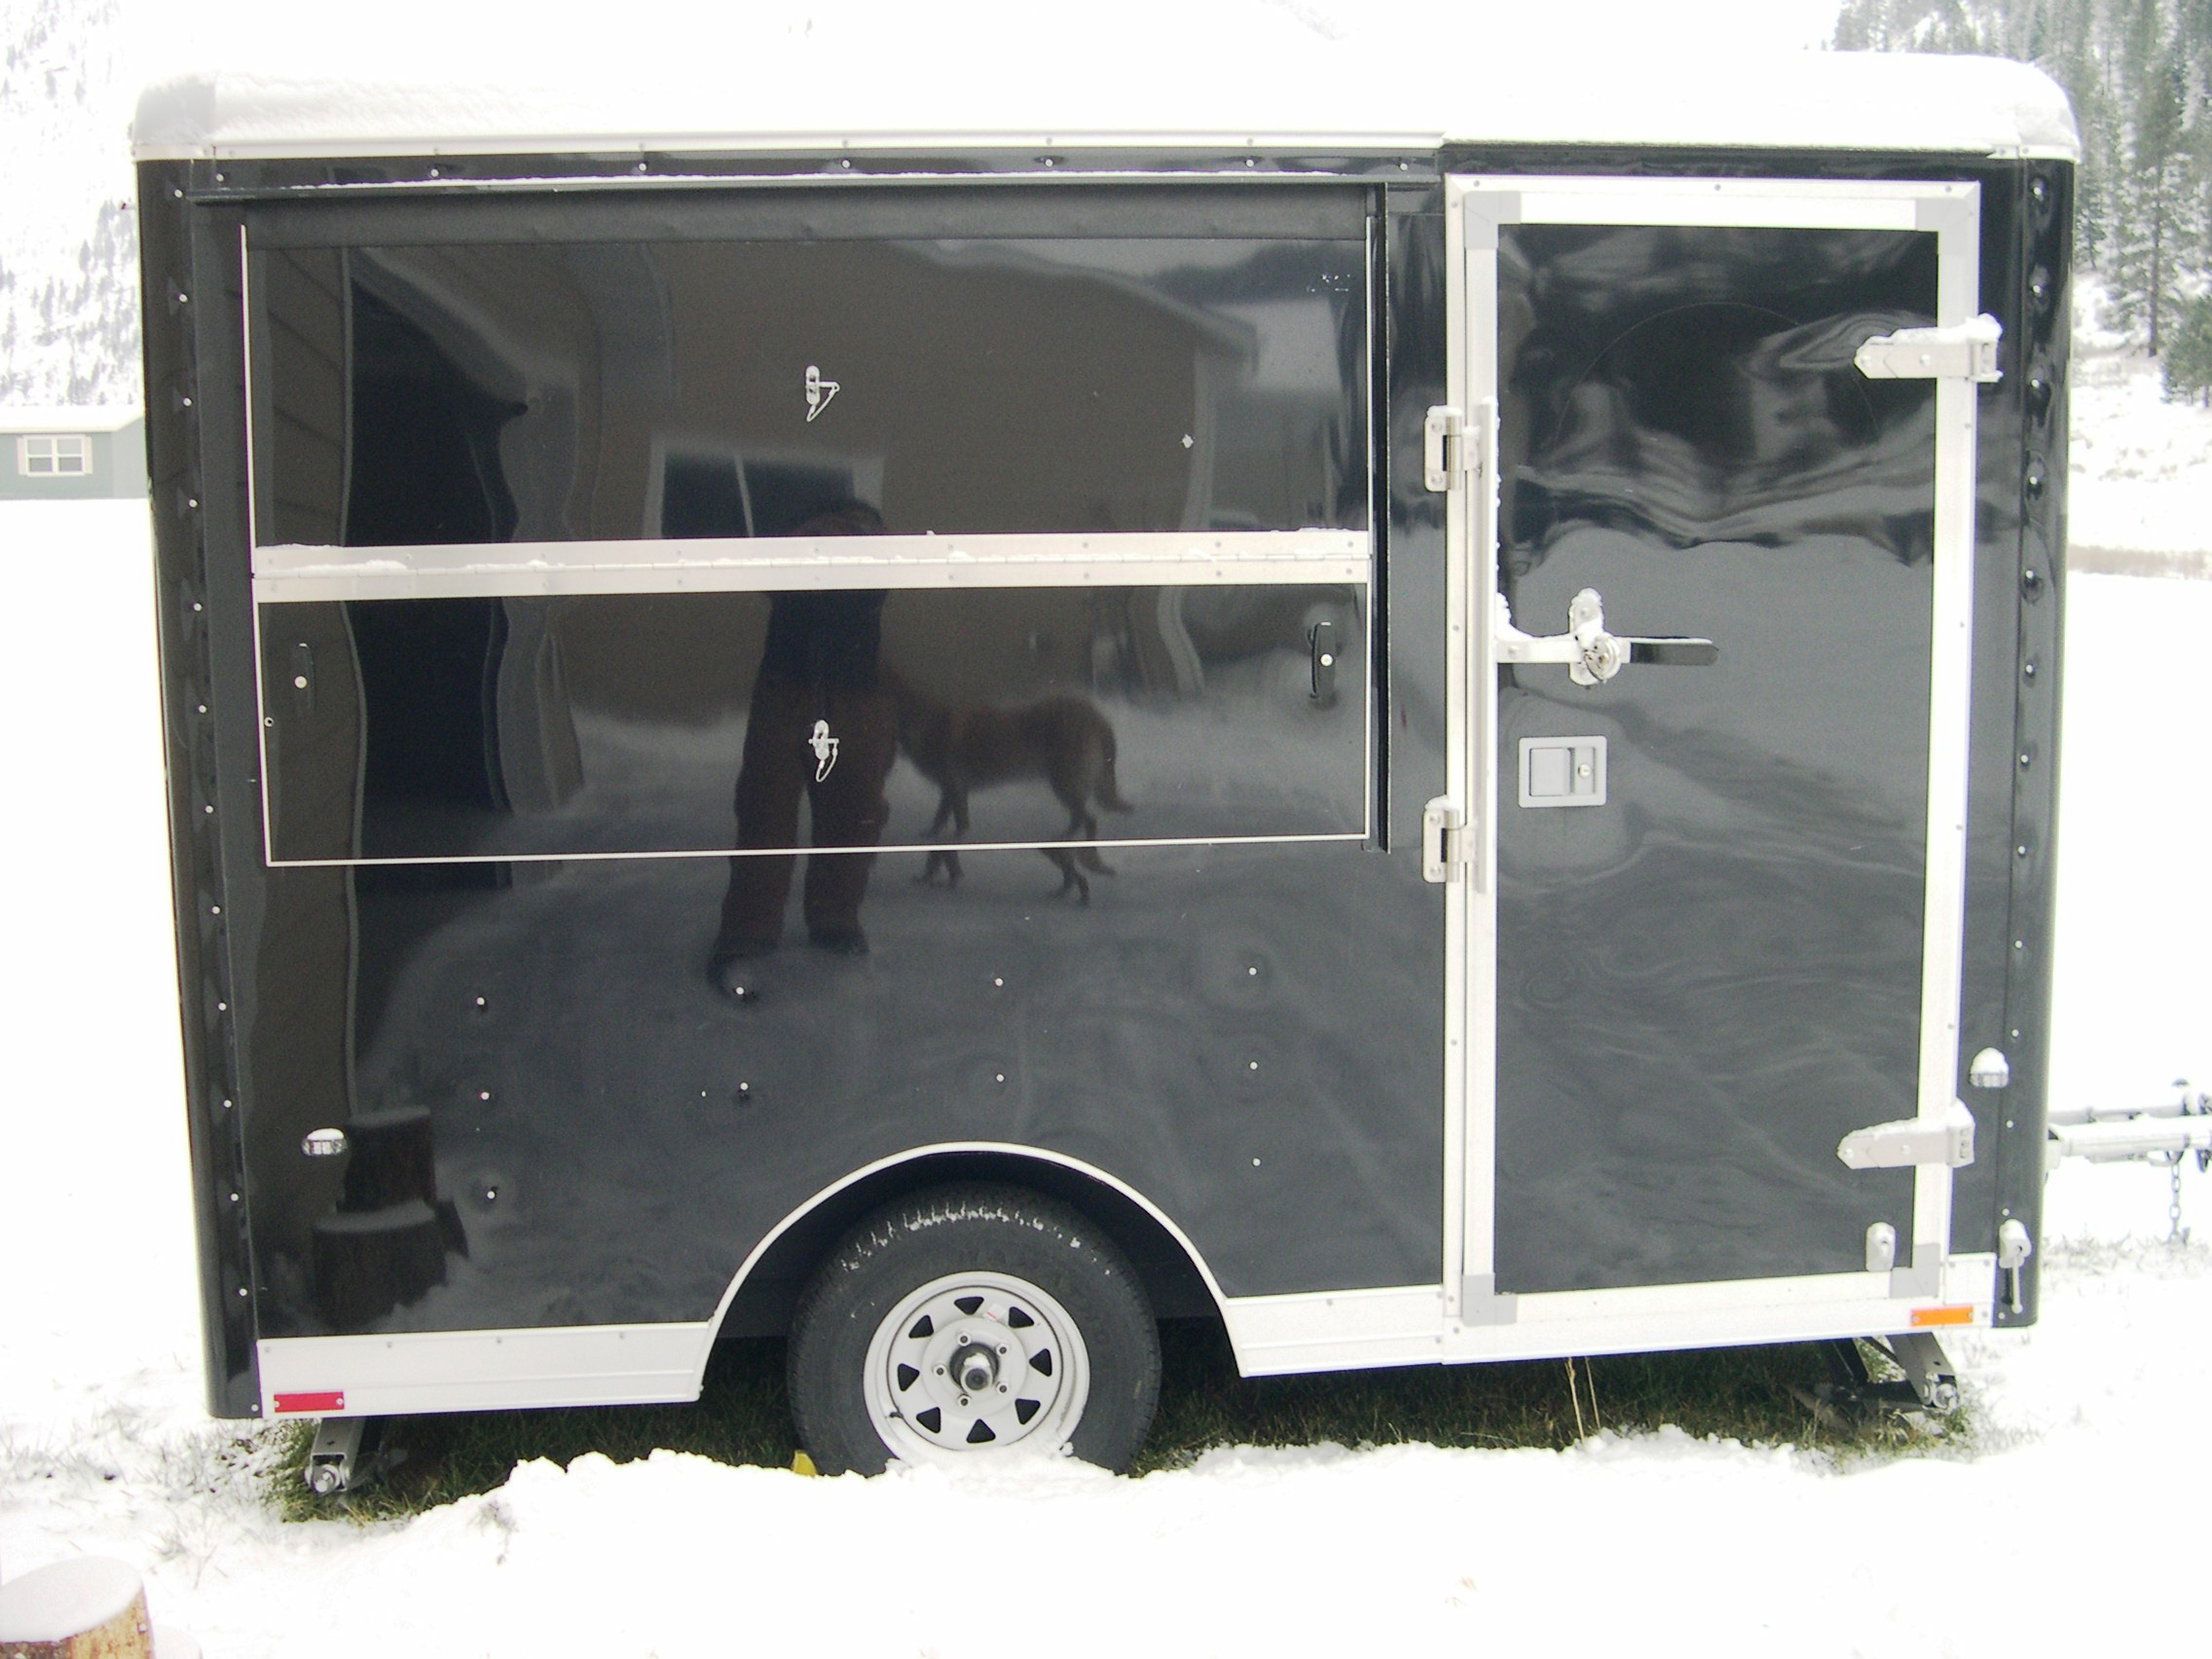 Inside our mobile sharpening shop - Dick Pierce Mobile Sharpening Trailer In Missoula Montana